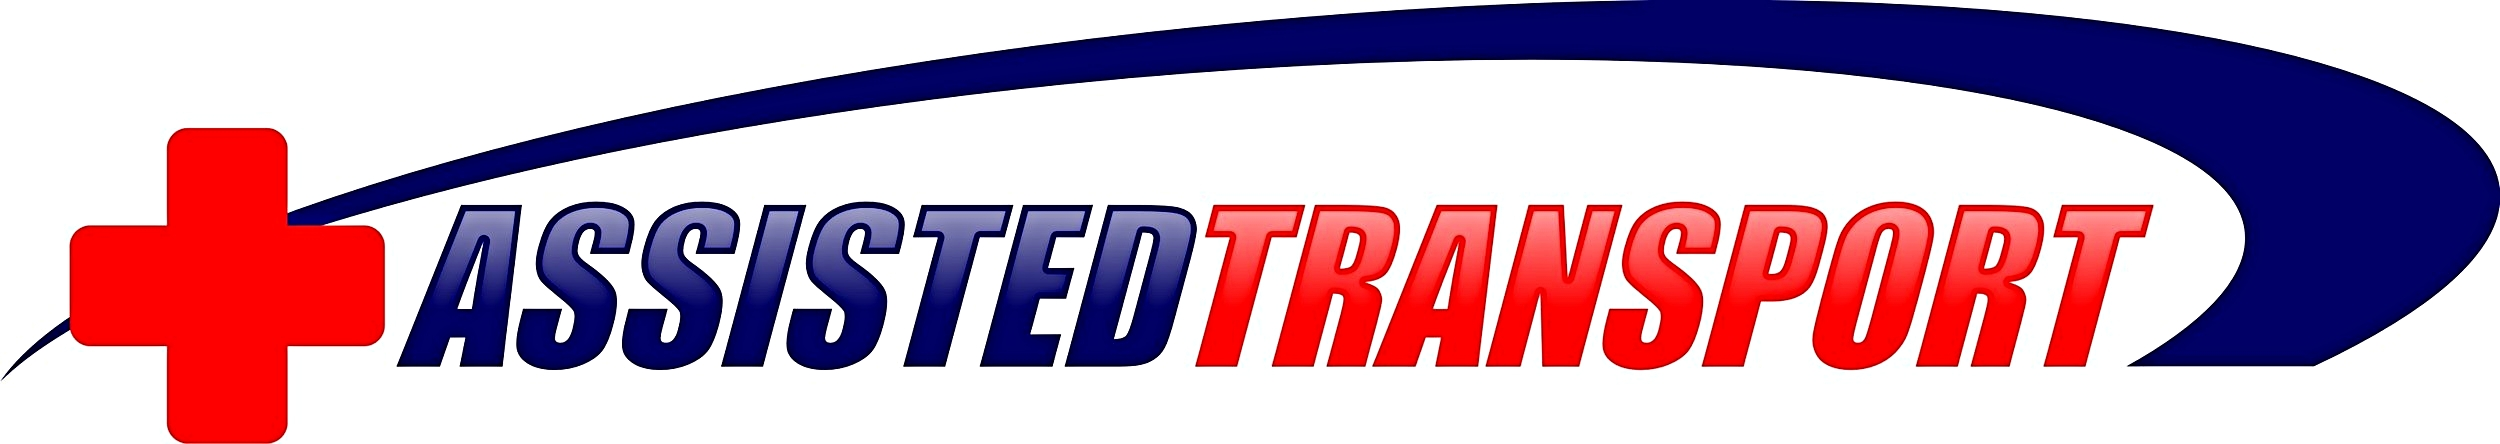 assisted transport_logo (2).jpg